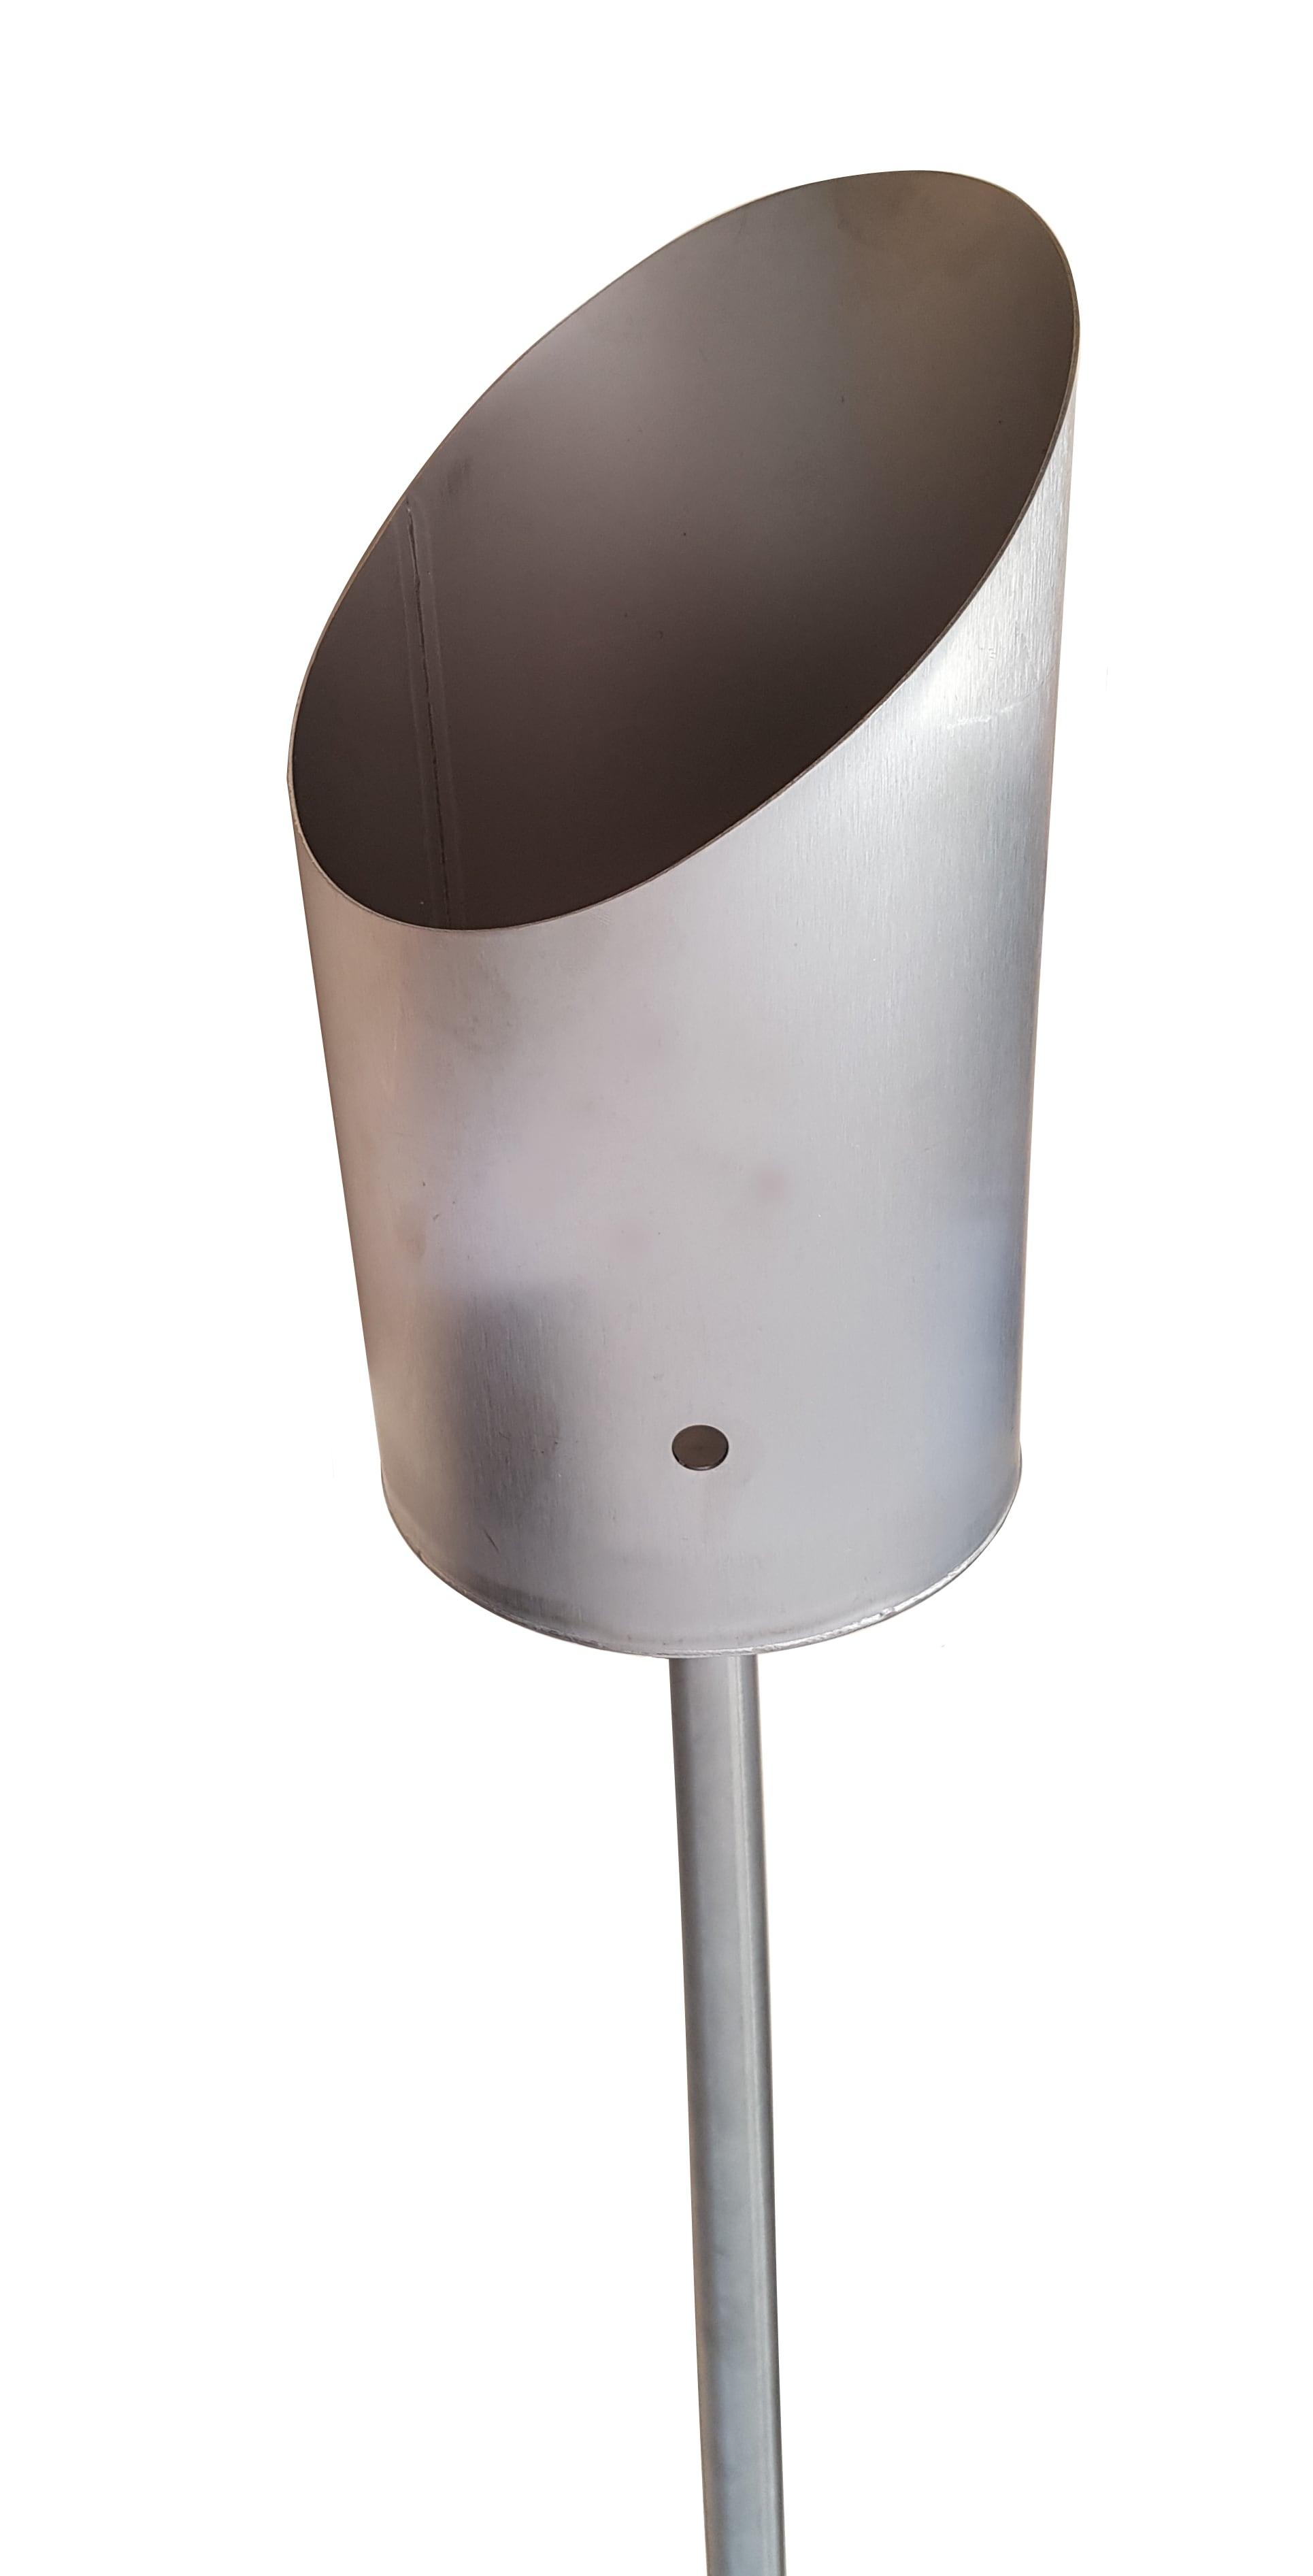 Gartenfackel Toilettenpapier-Fackel Klopapier